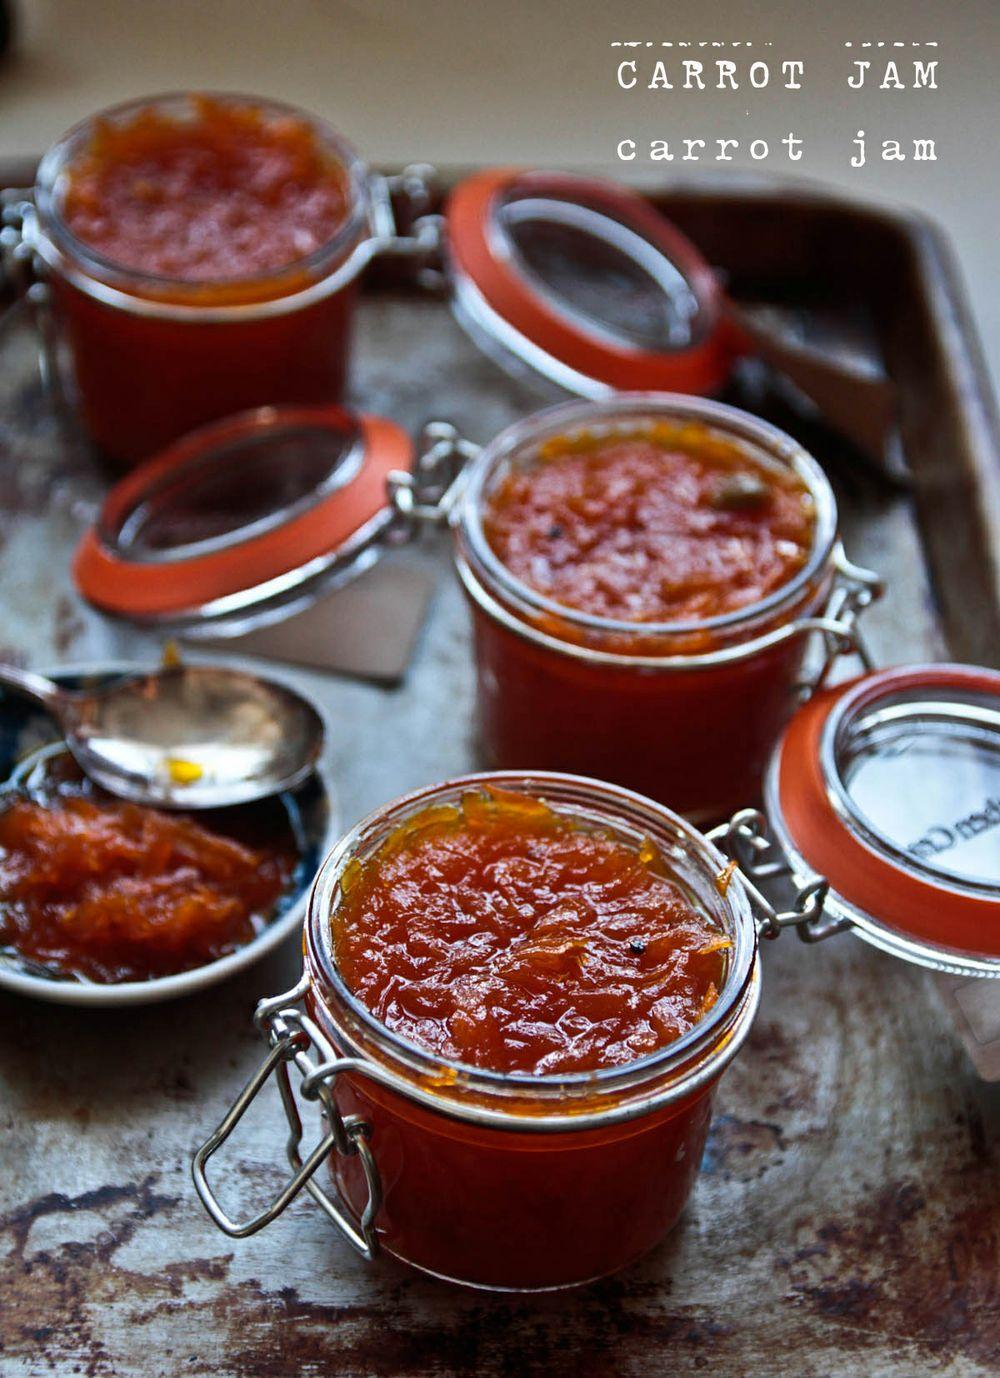 m-carrot-marmalade-2-3